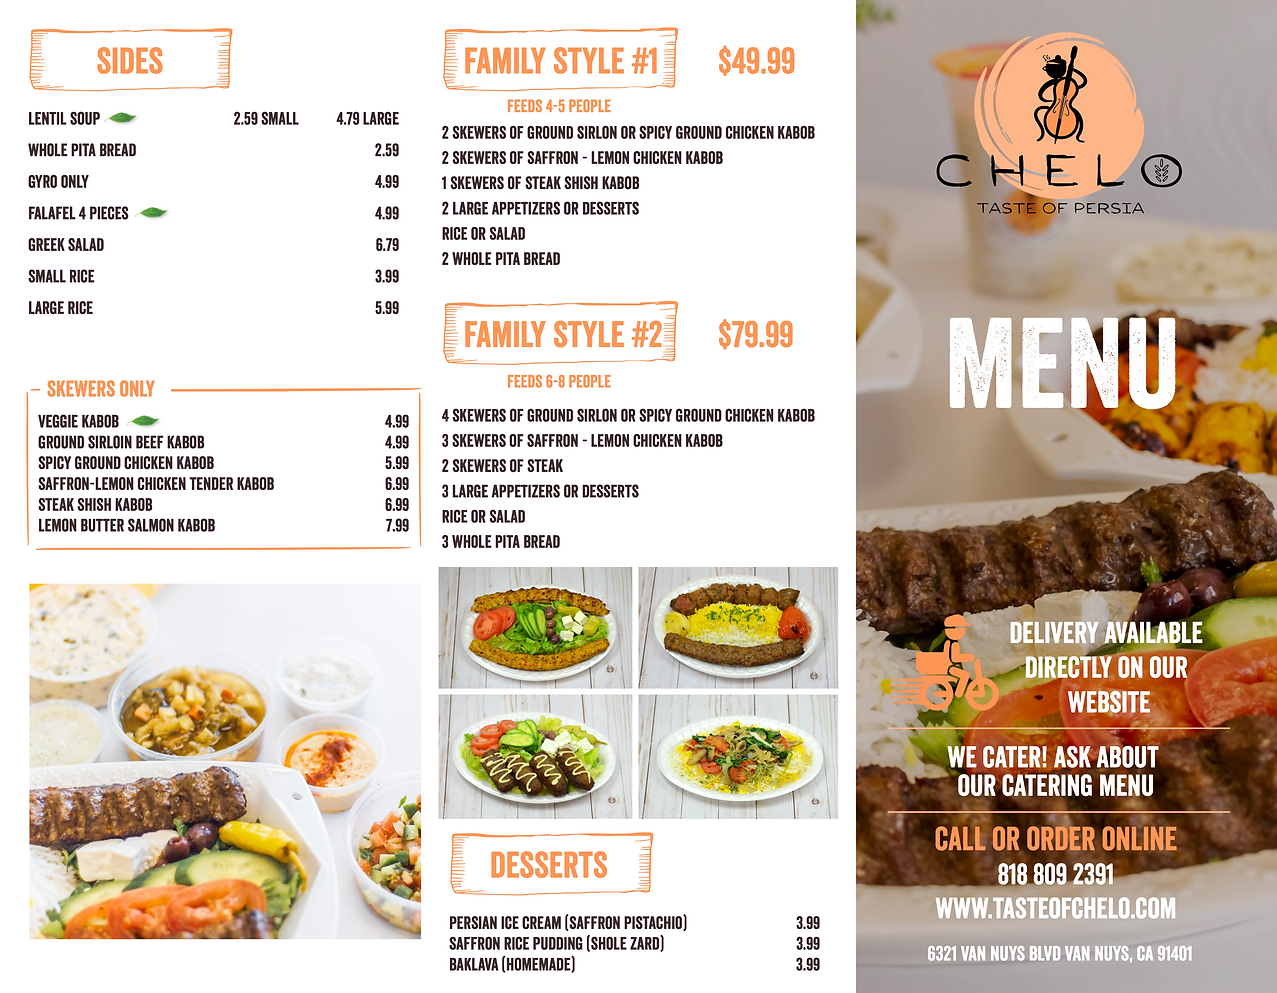 chello menu 9.png